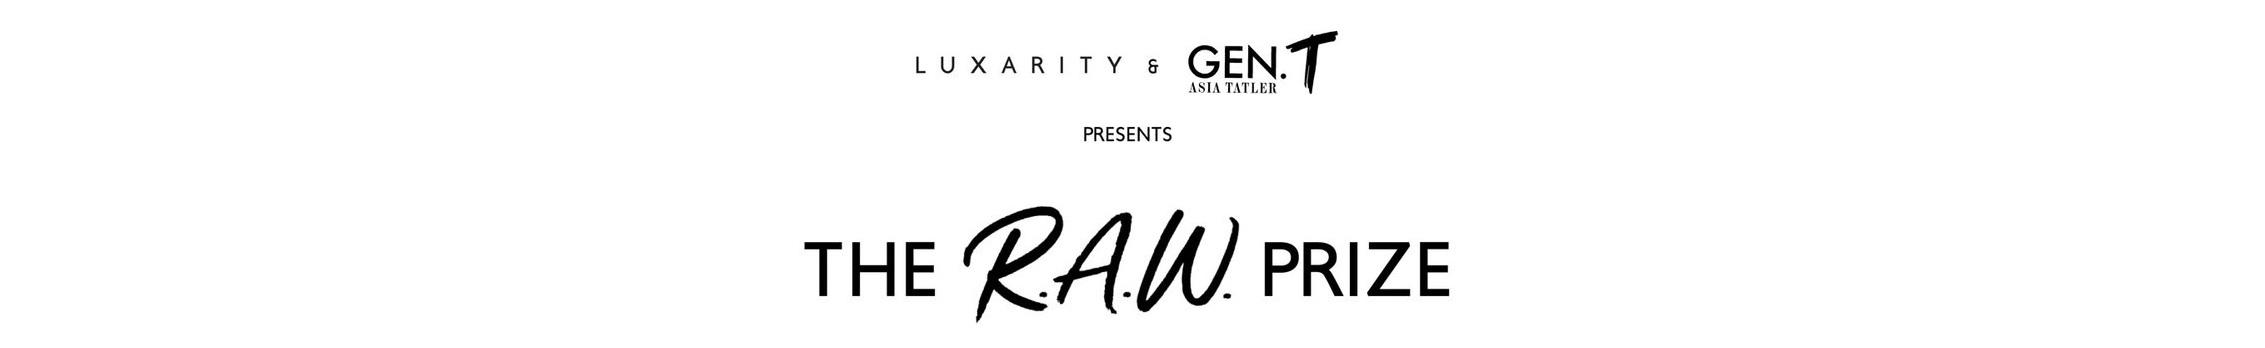 RAW-prize-logo2_extend.jpg